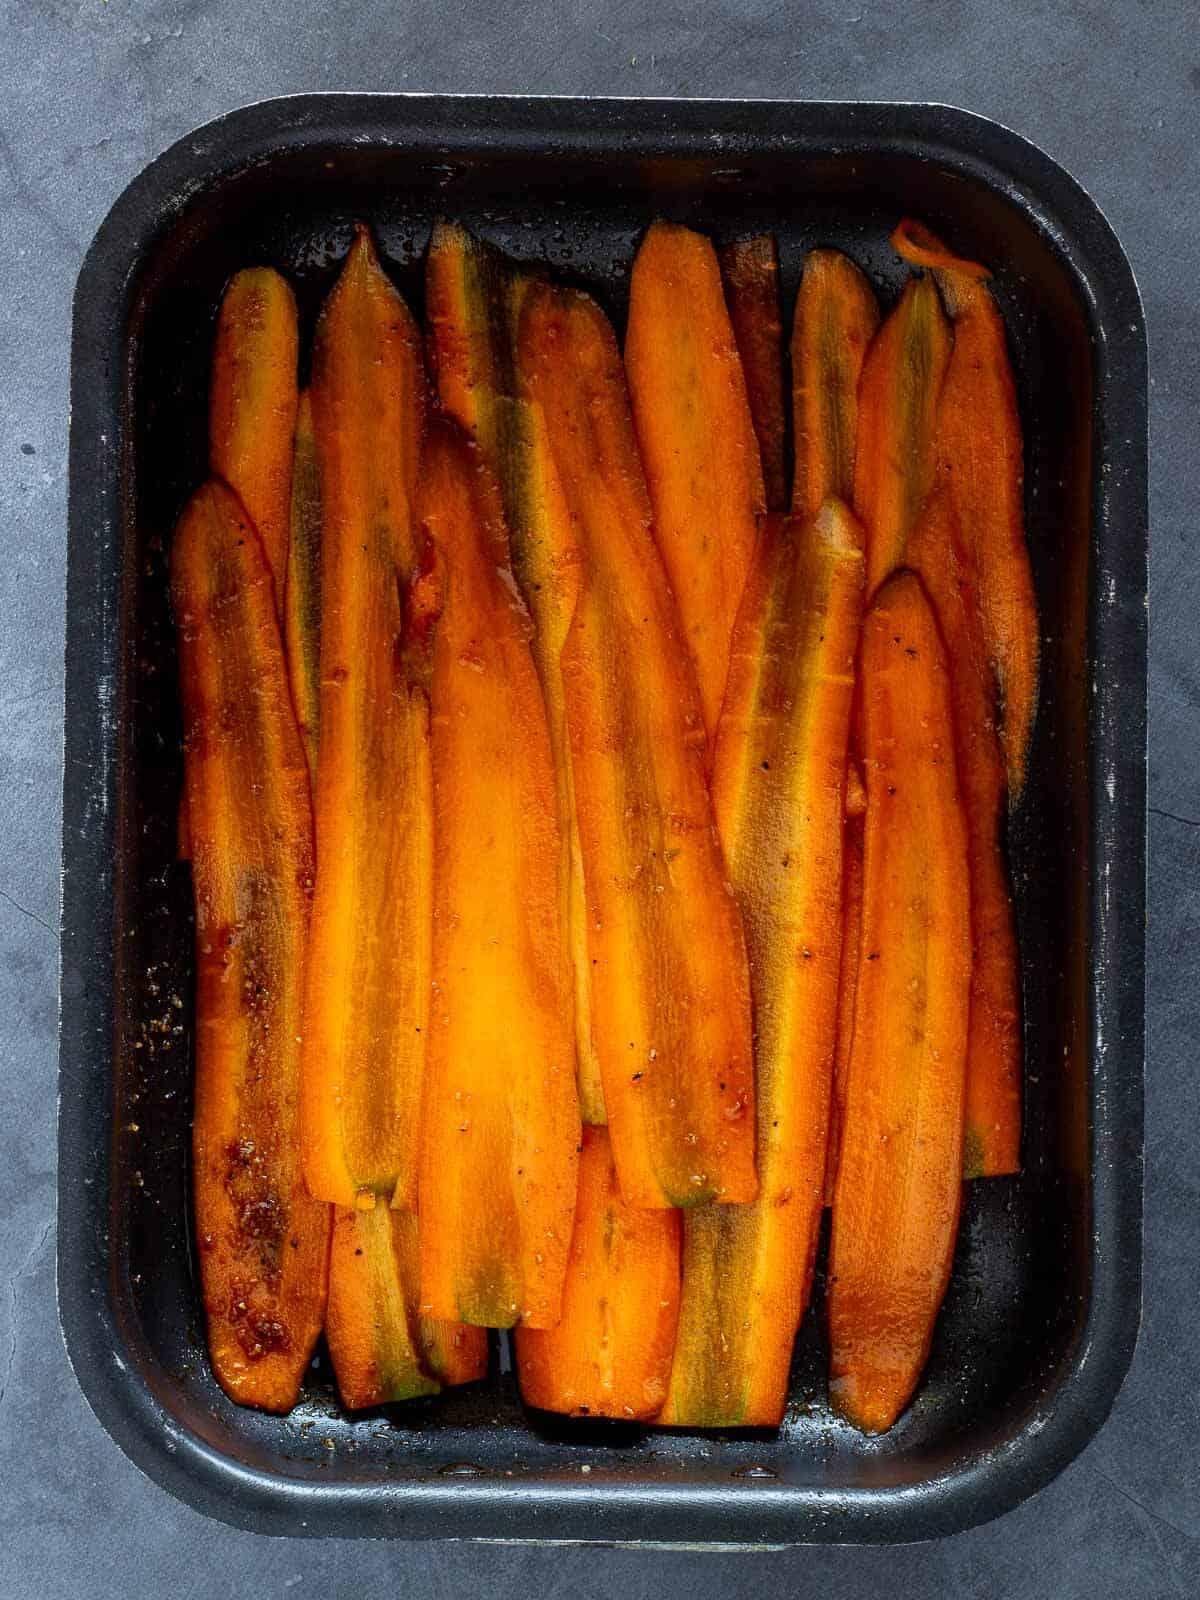 Carrot Bacon Marinade in sallow container